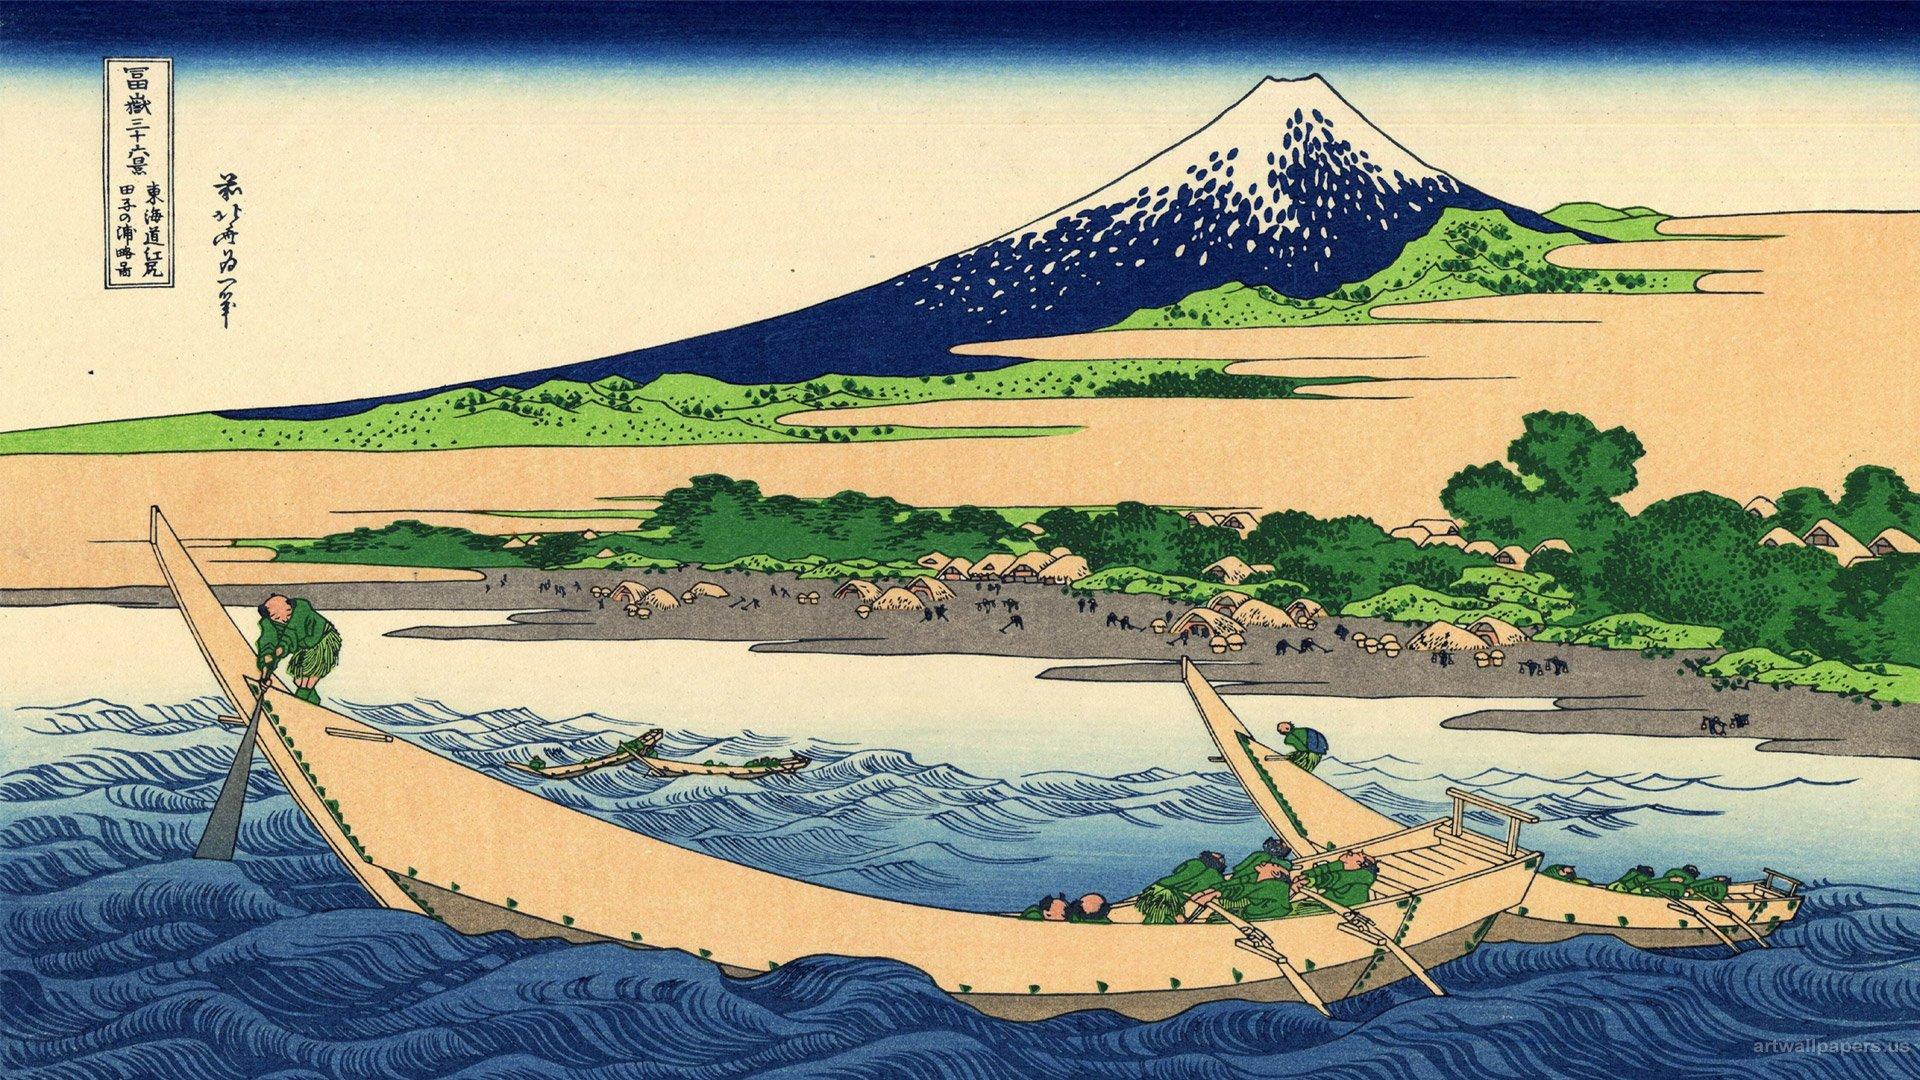 Hokusai Wallpaper The Great Wave at Kanagawa Art Print Wallpapers 1920x1080